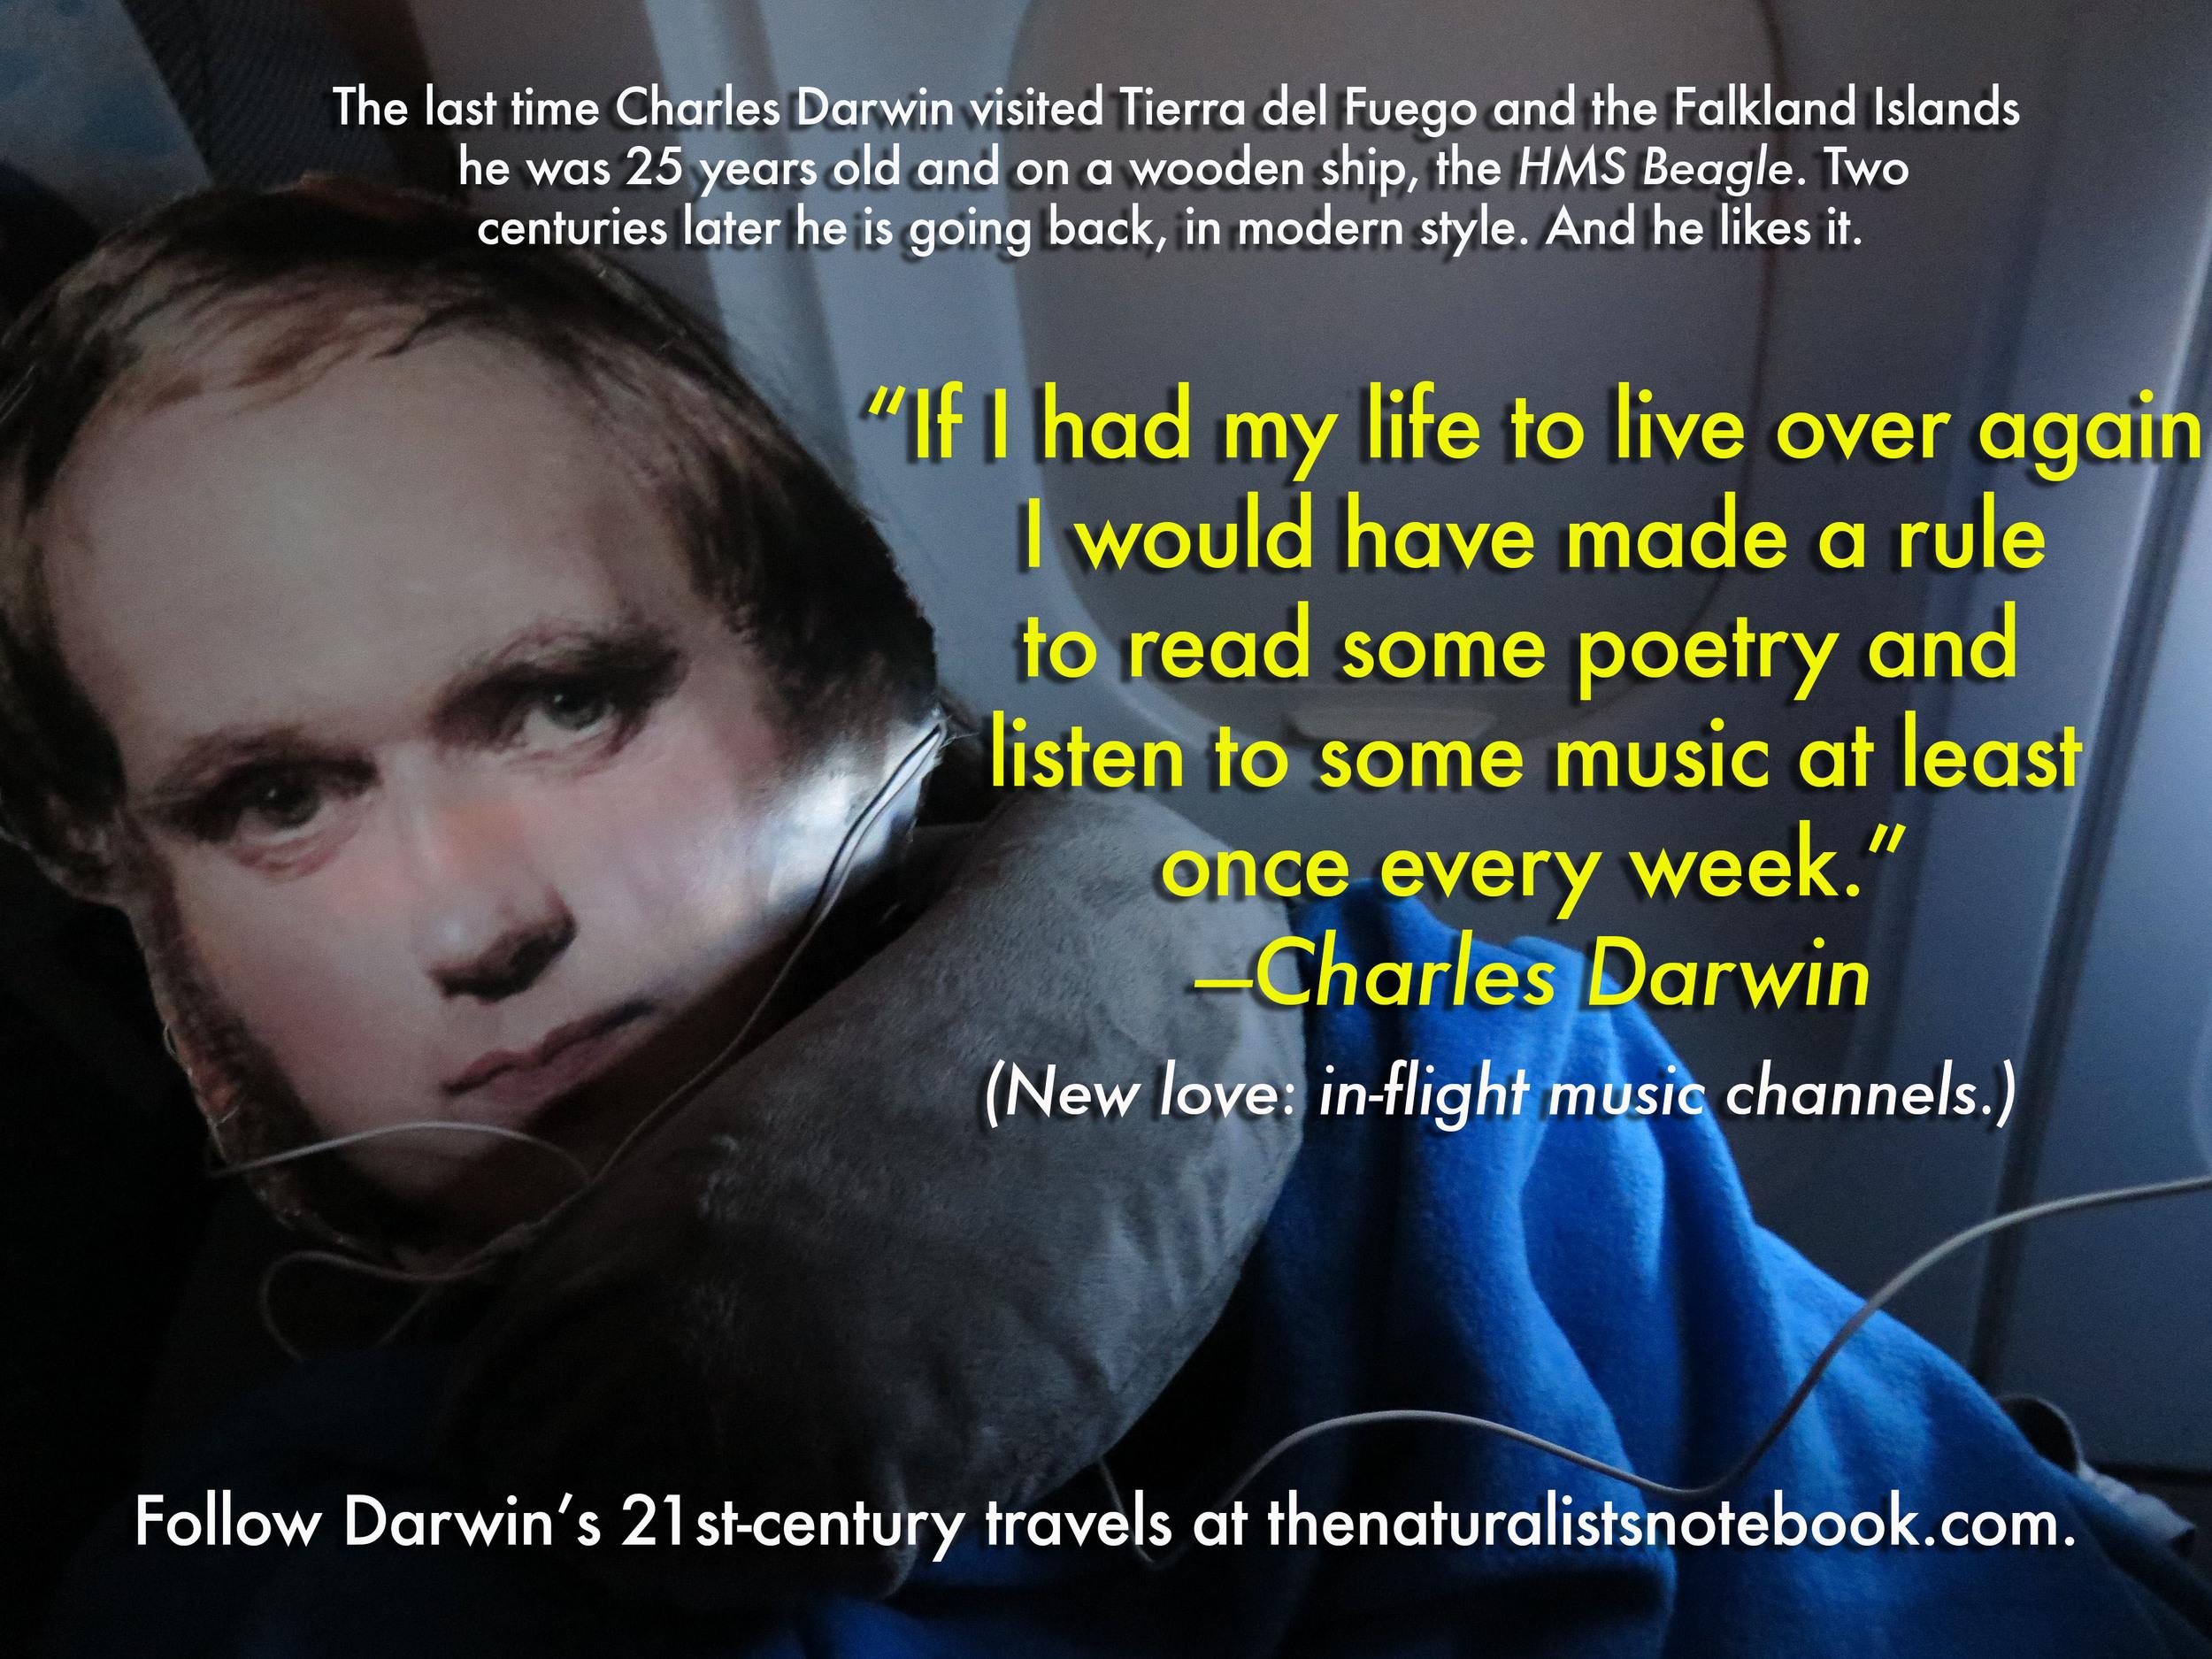 Charles Darwin travels